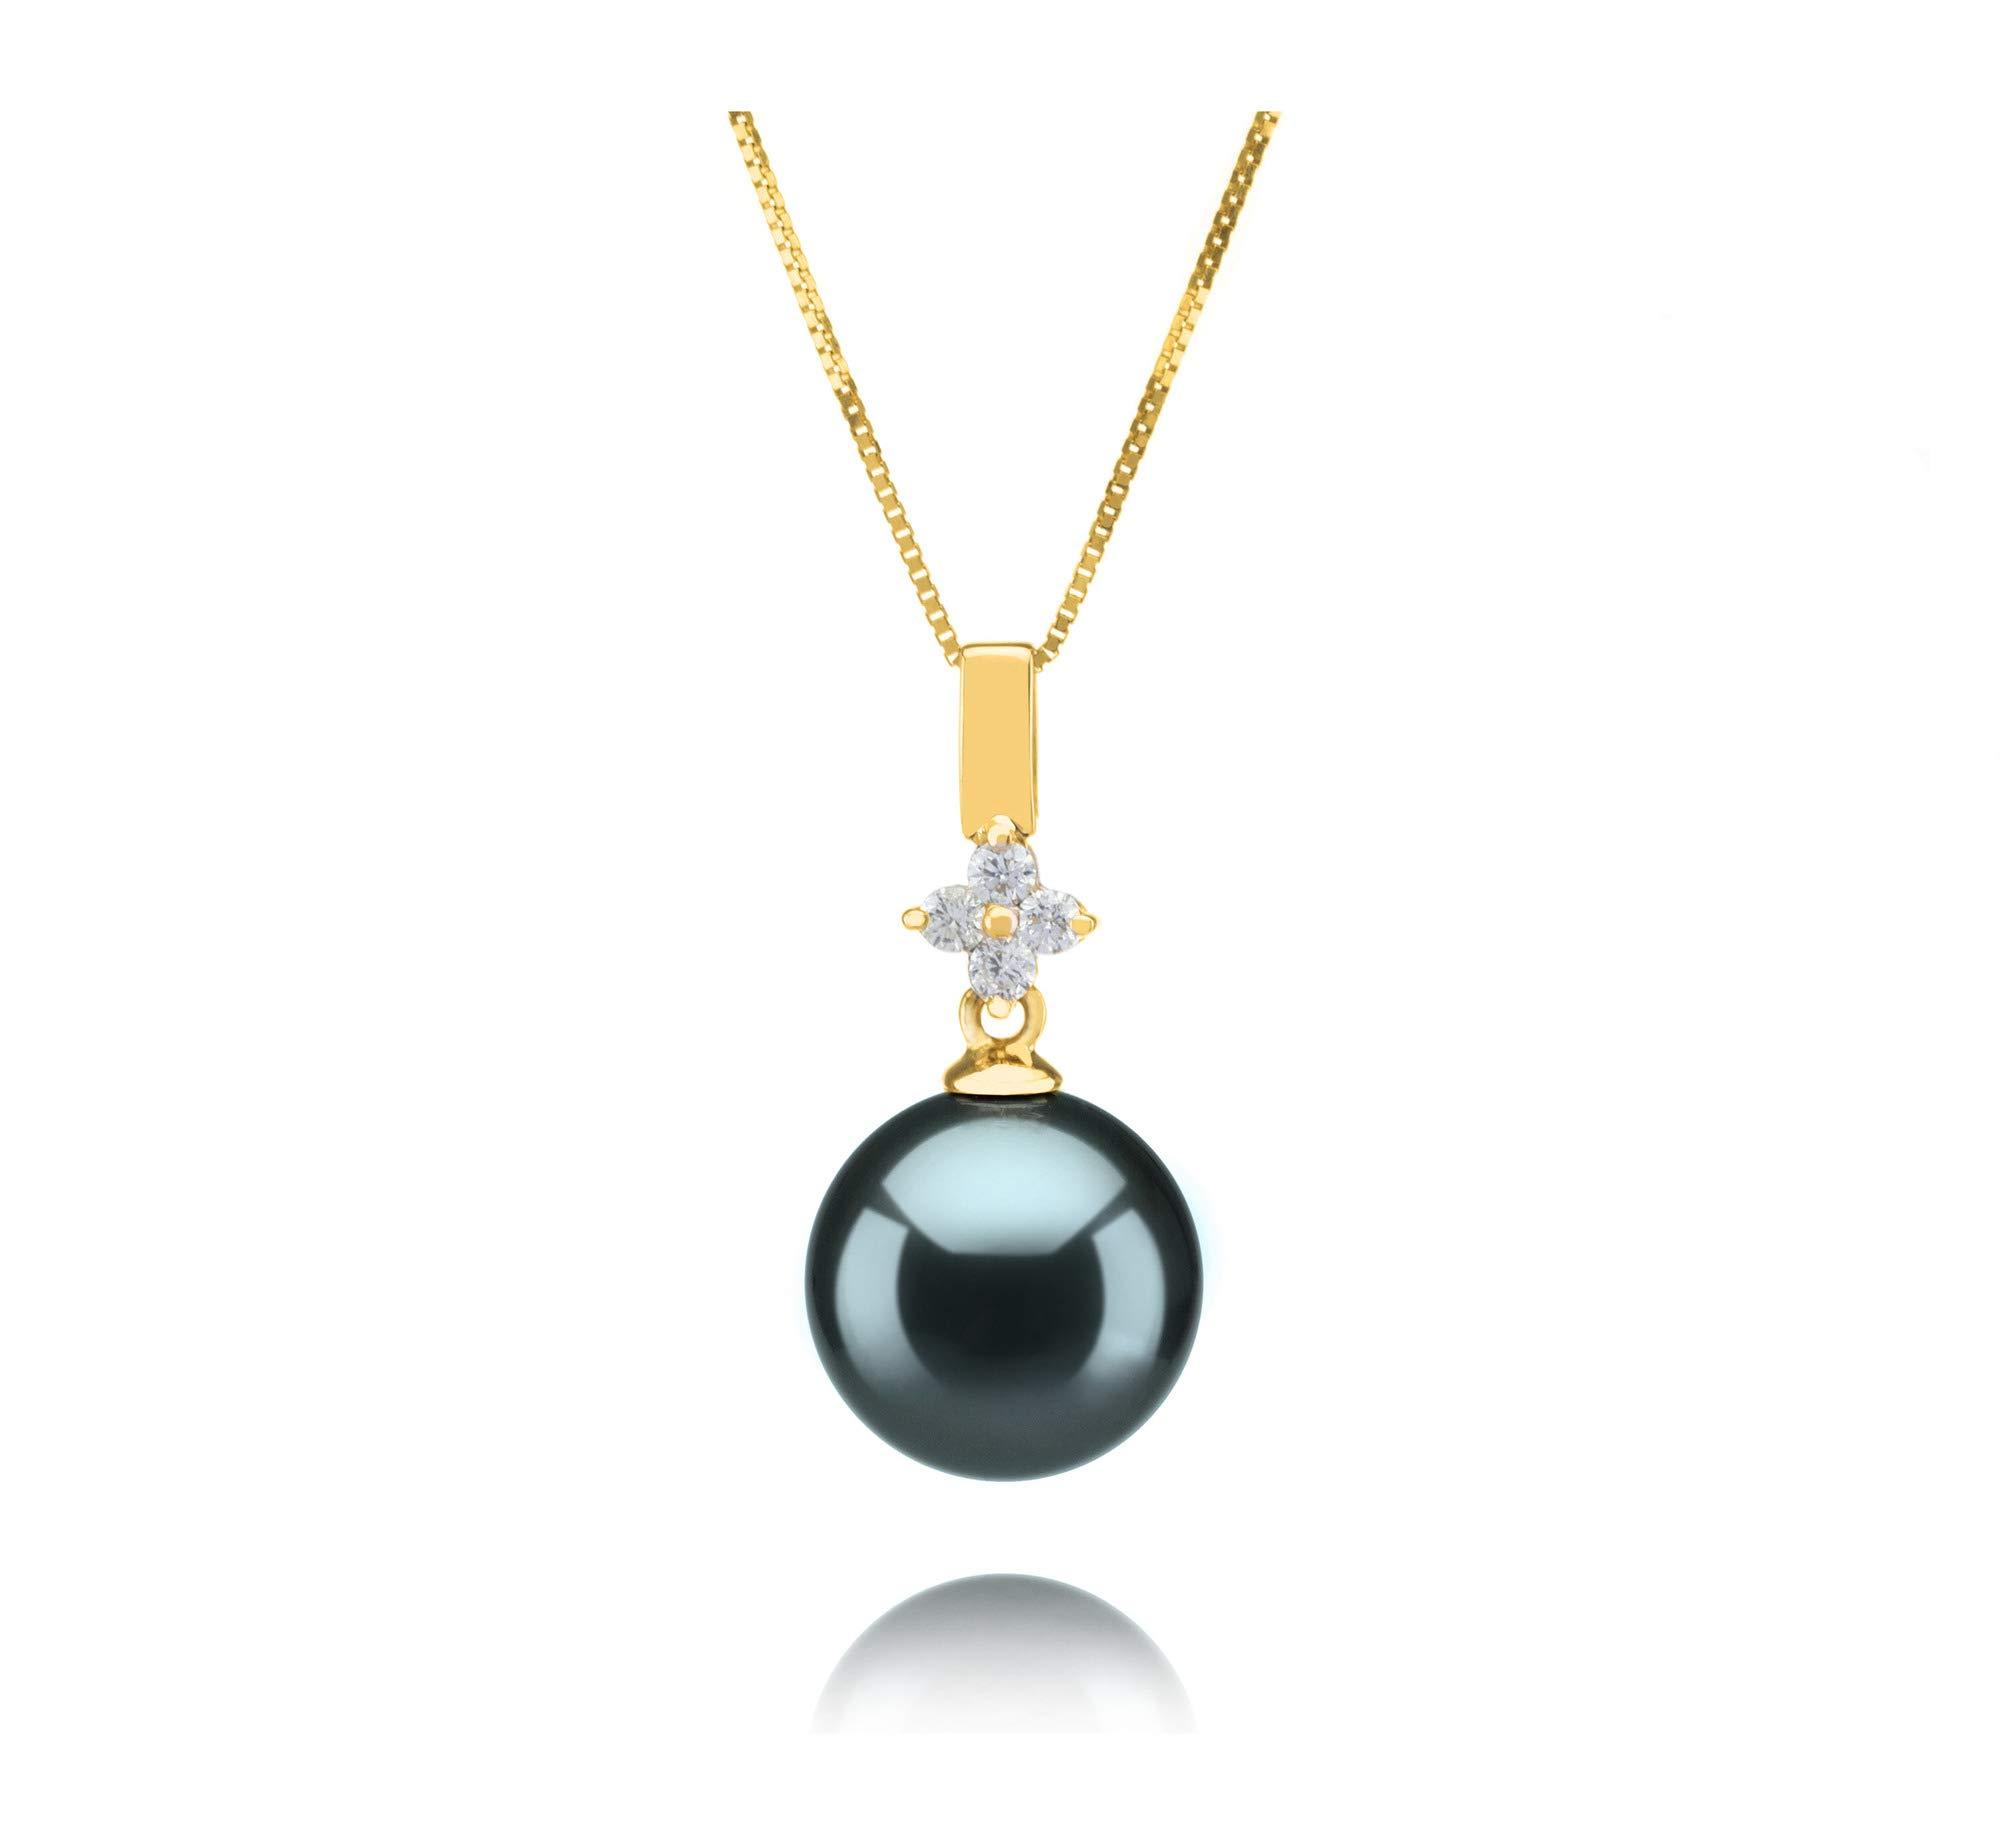 Hilda Black 10-11mm AAA Quality Tahitian 14K Yellow Gold Cultured Pearl Pendant For Women